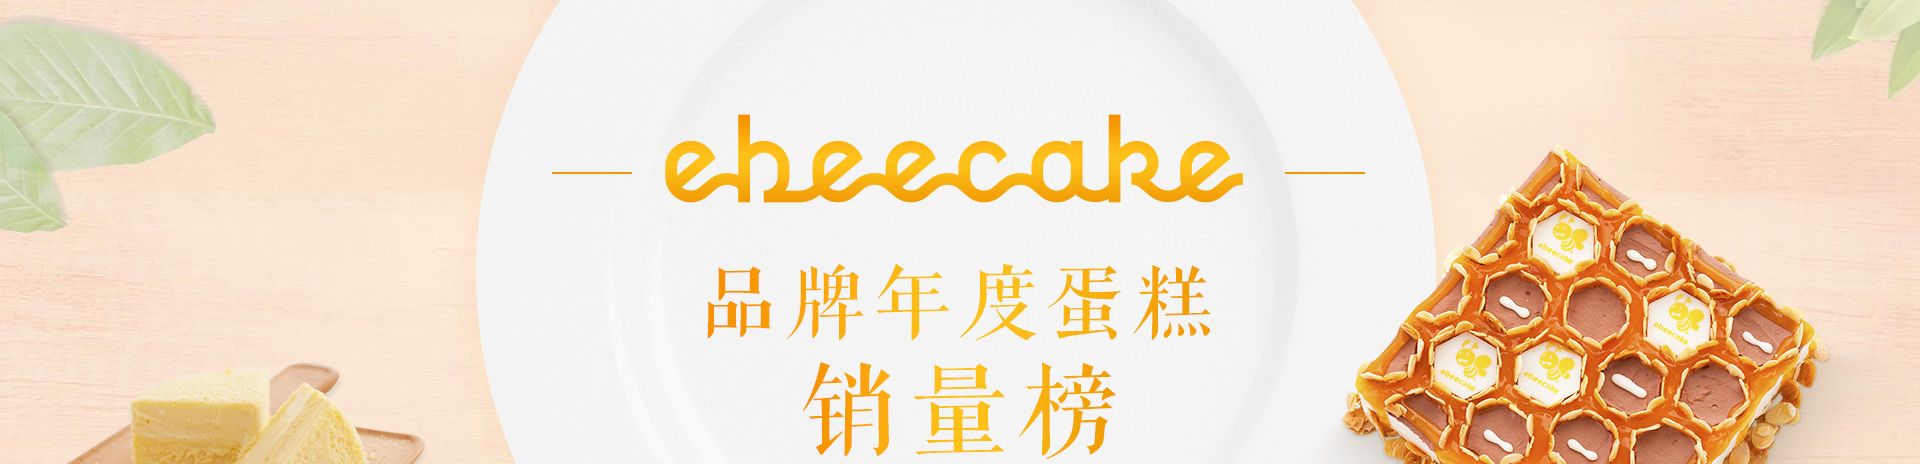 ebeecake小蜜蜂蛋糕 年度蛋糕销量榜